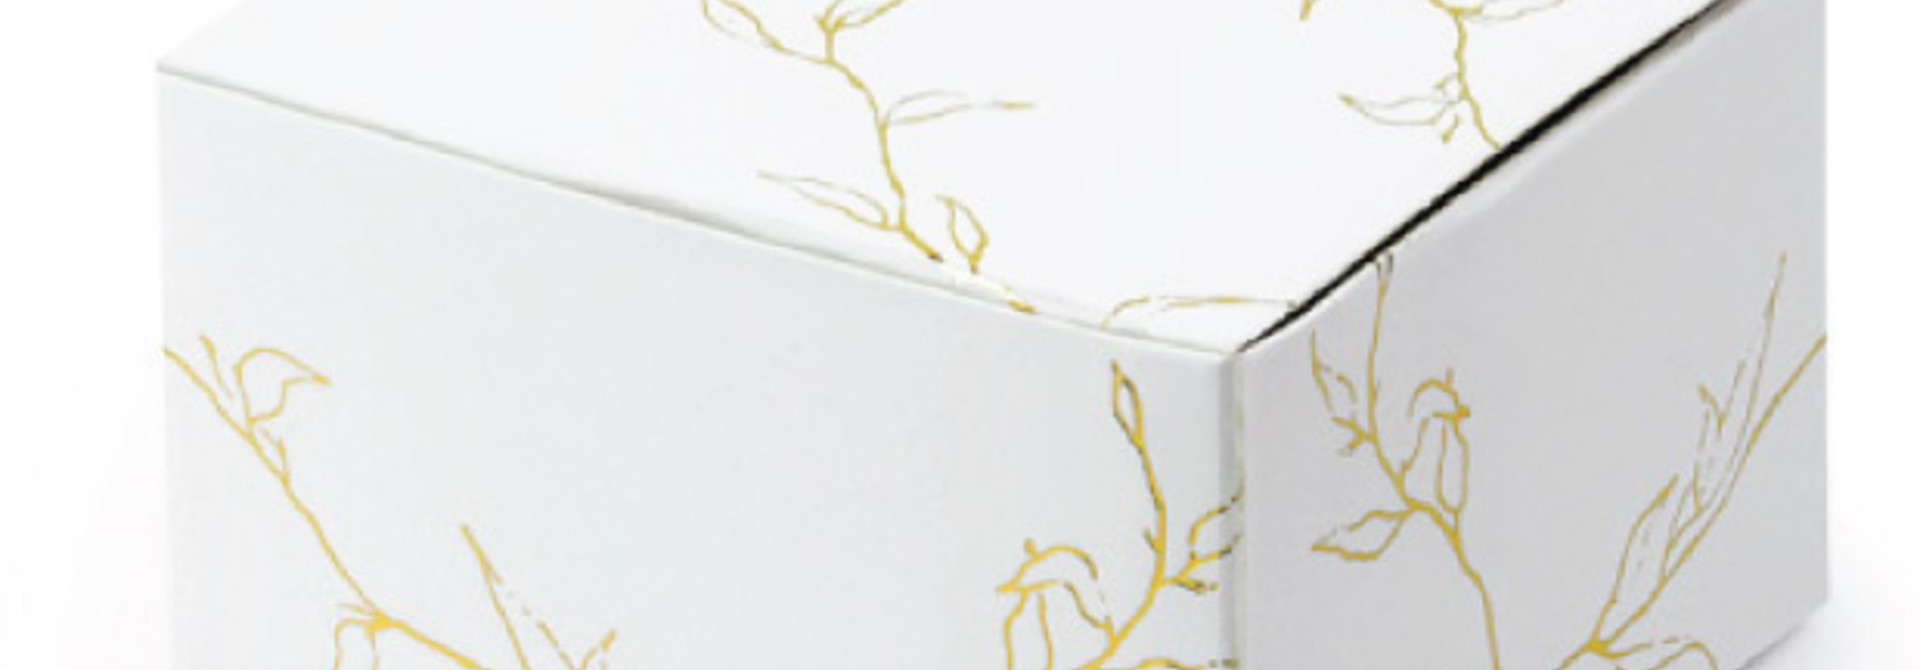 Bedankdoosjes gold branches (10st)